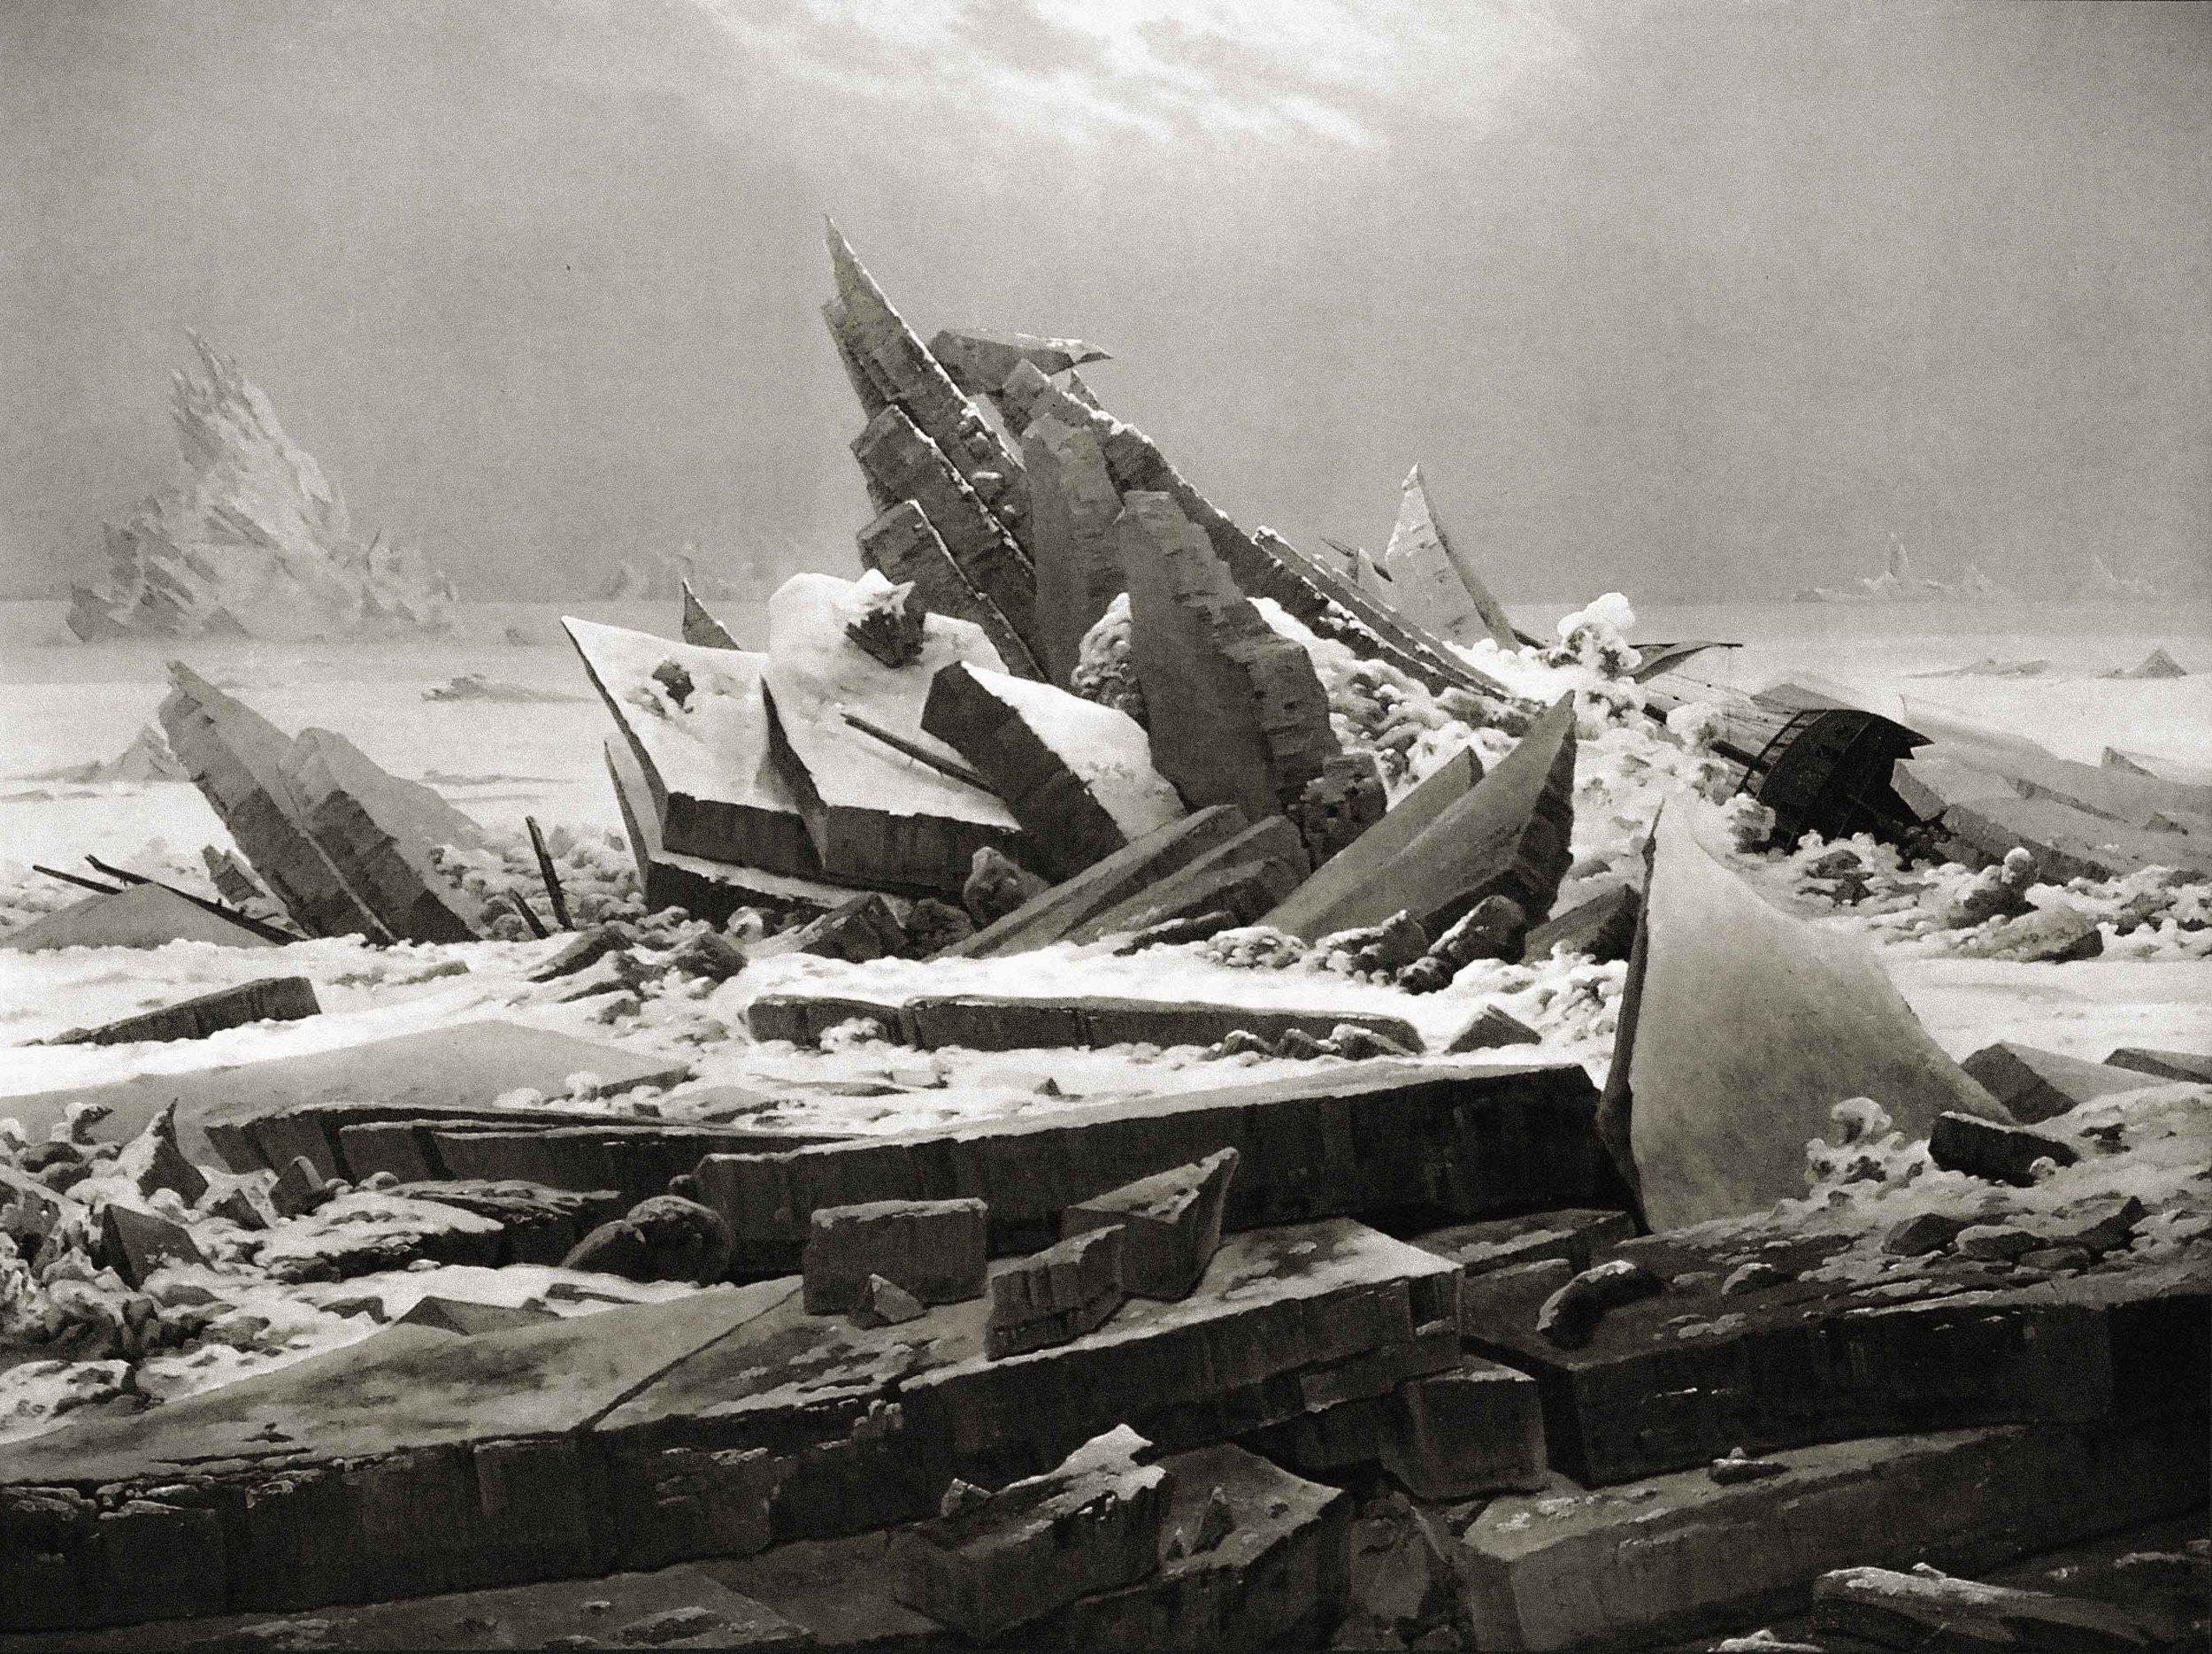 Caspar David Friedrich, The Sea of Ice aka Polar Sea, digitally manipulated,1823/1824   Placement : XXX